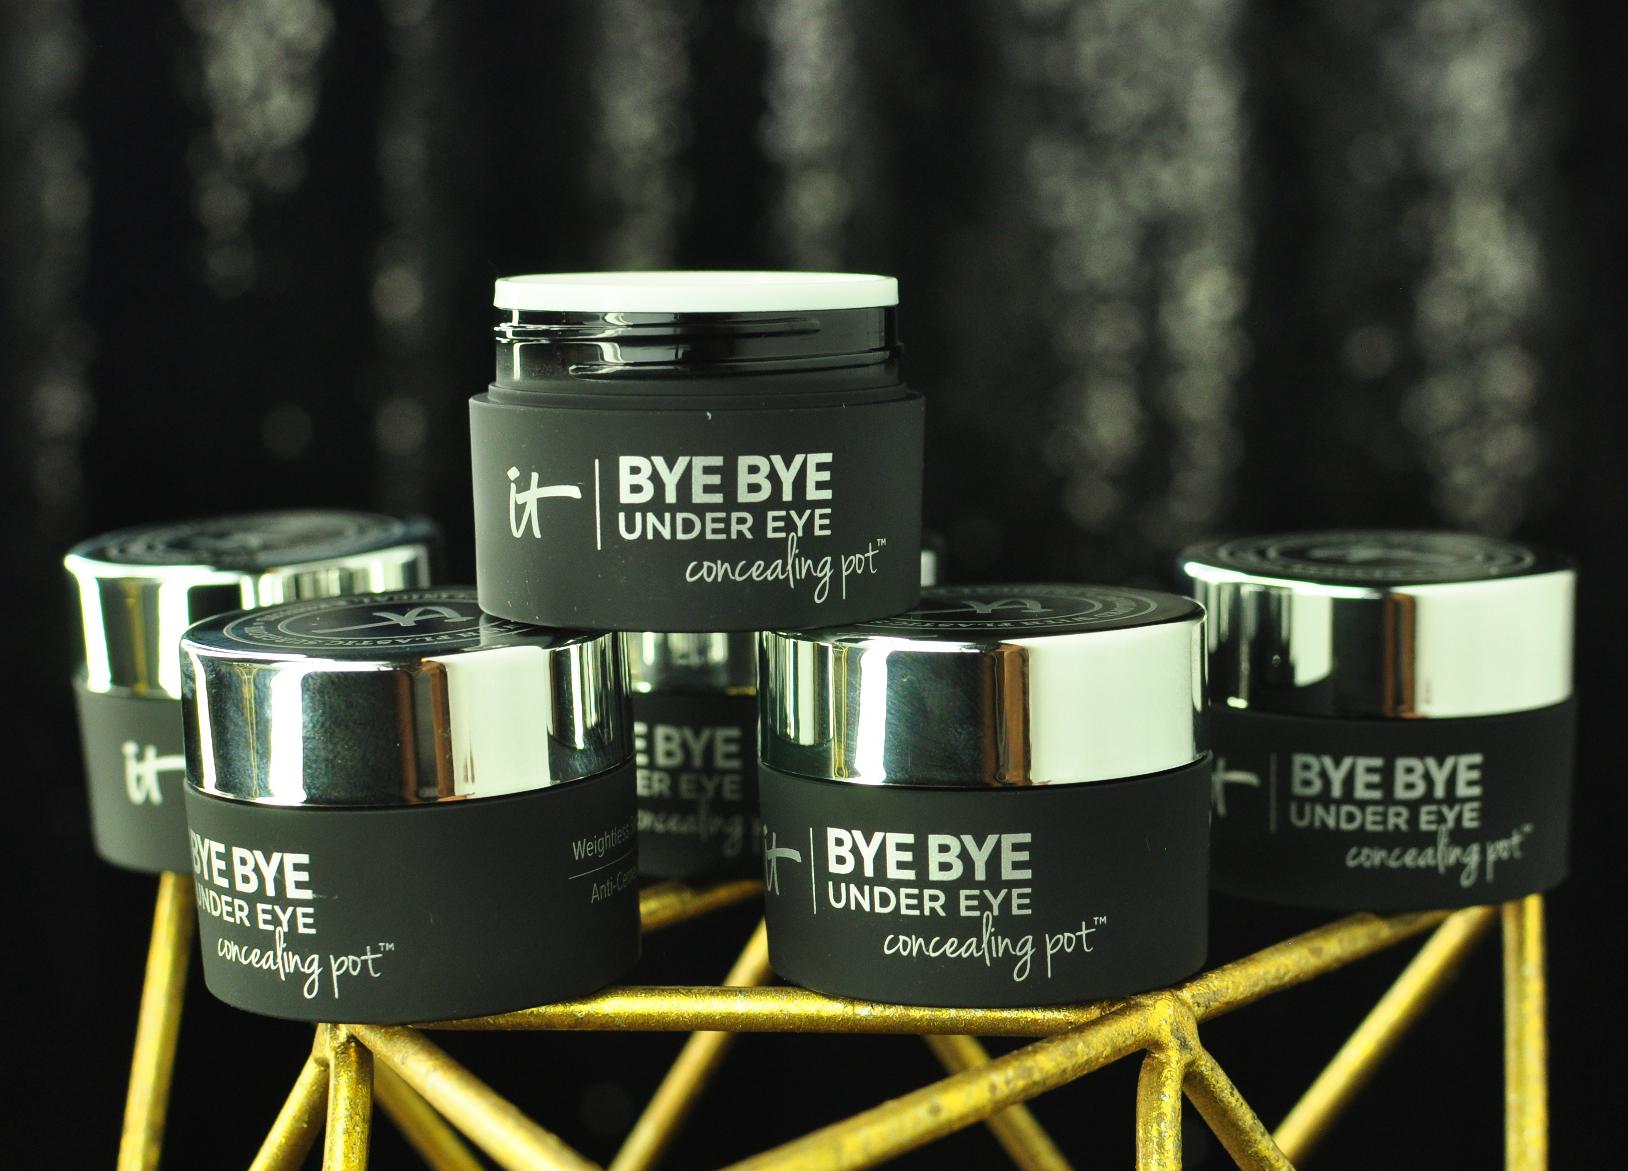 IT Cosmetics Bye Bye Under Eye Concealing Pot Review